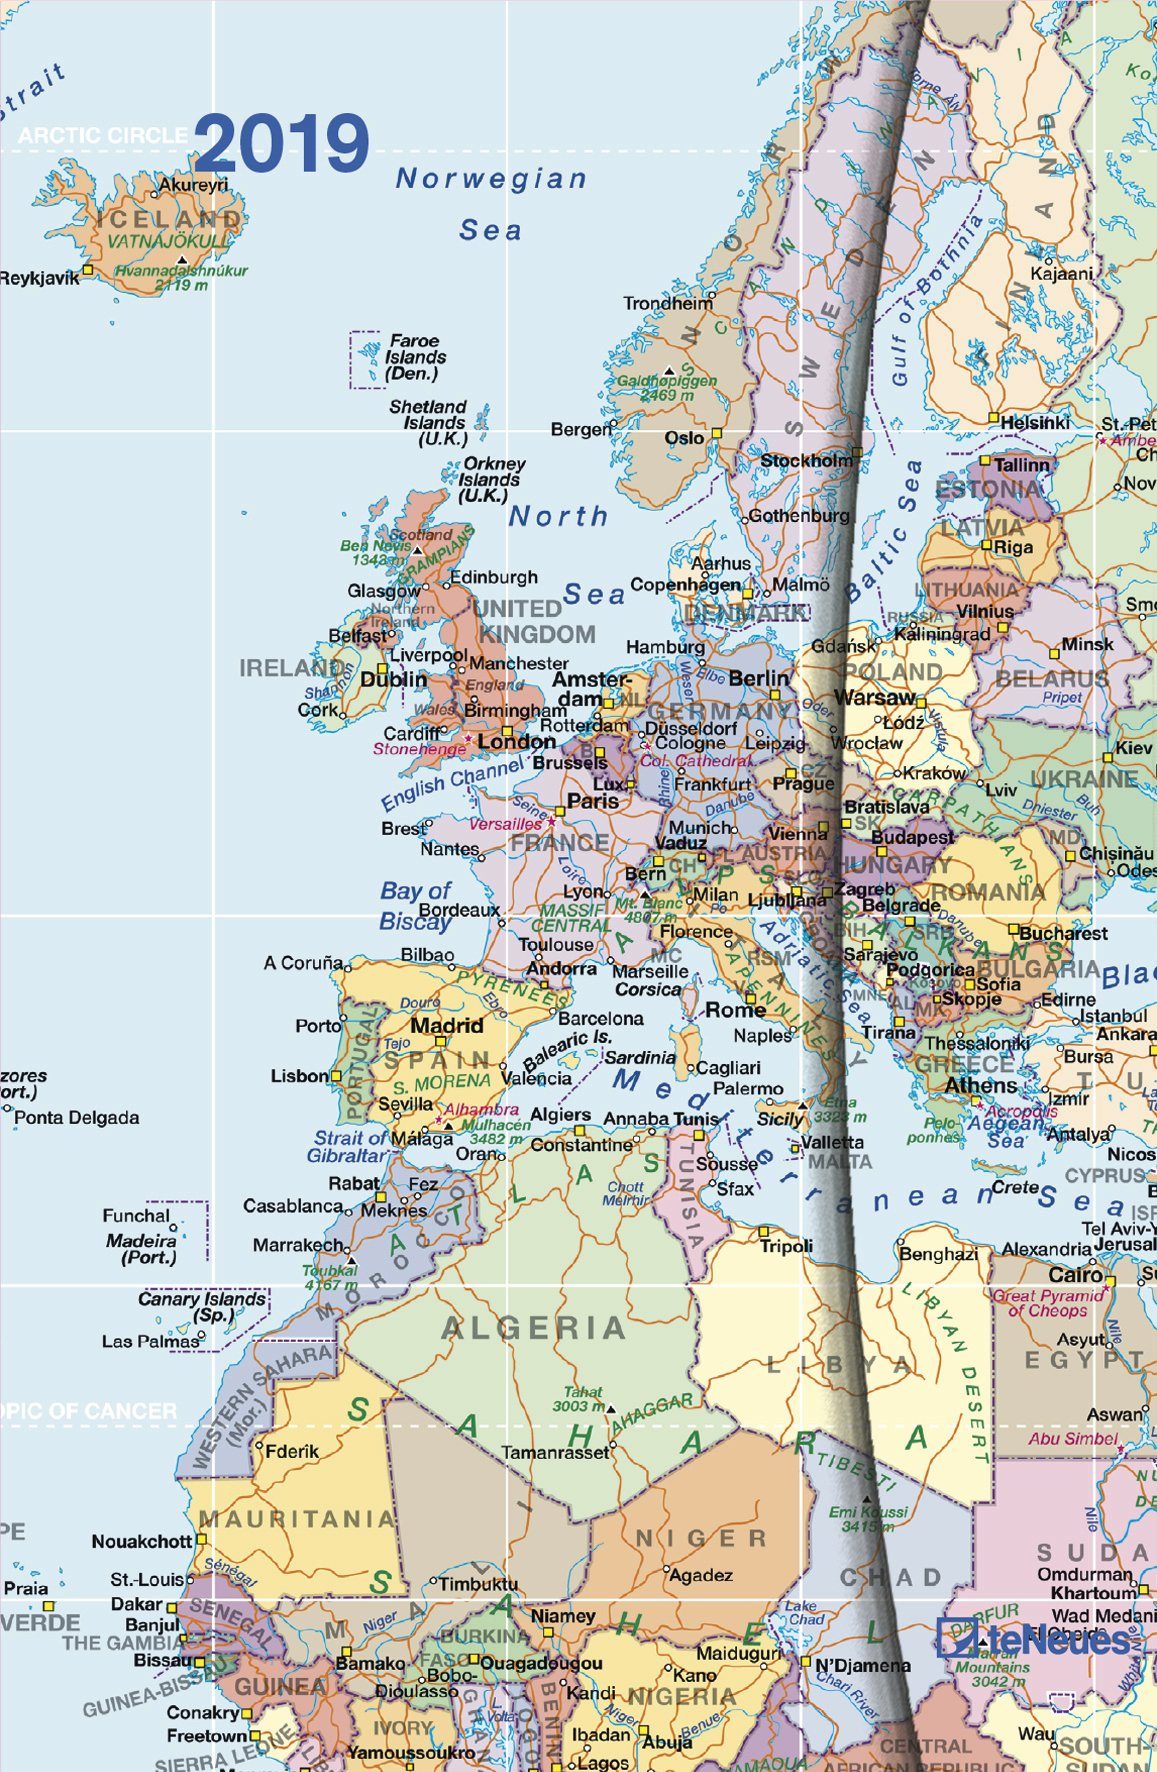 English Map Of The World.2019 World Maps Diary Teneues Magneto Diary 10 X 15 Cm English